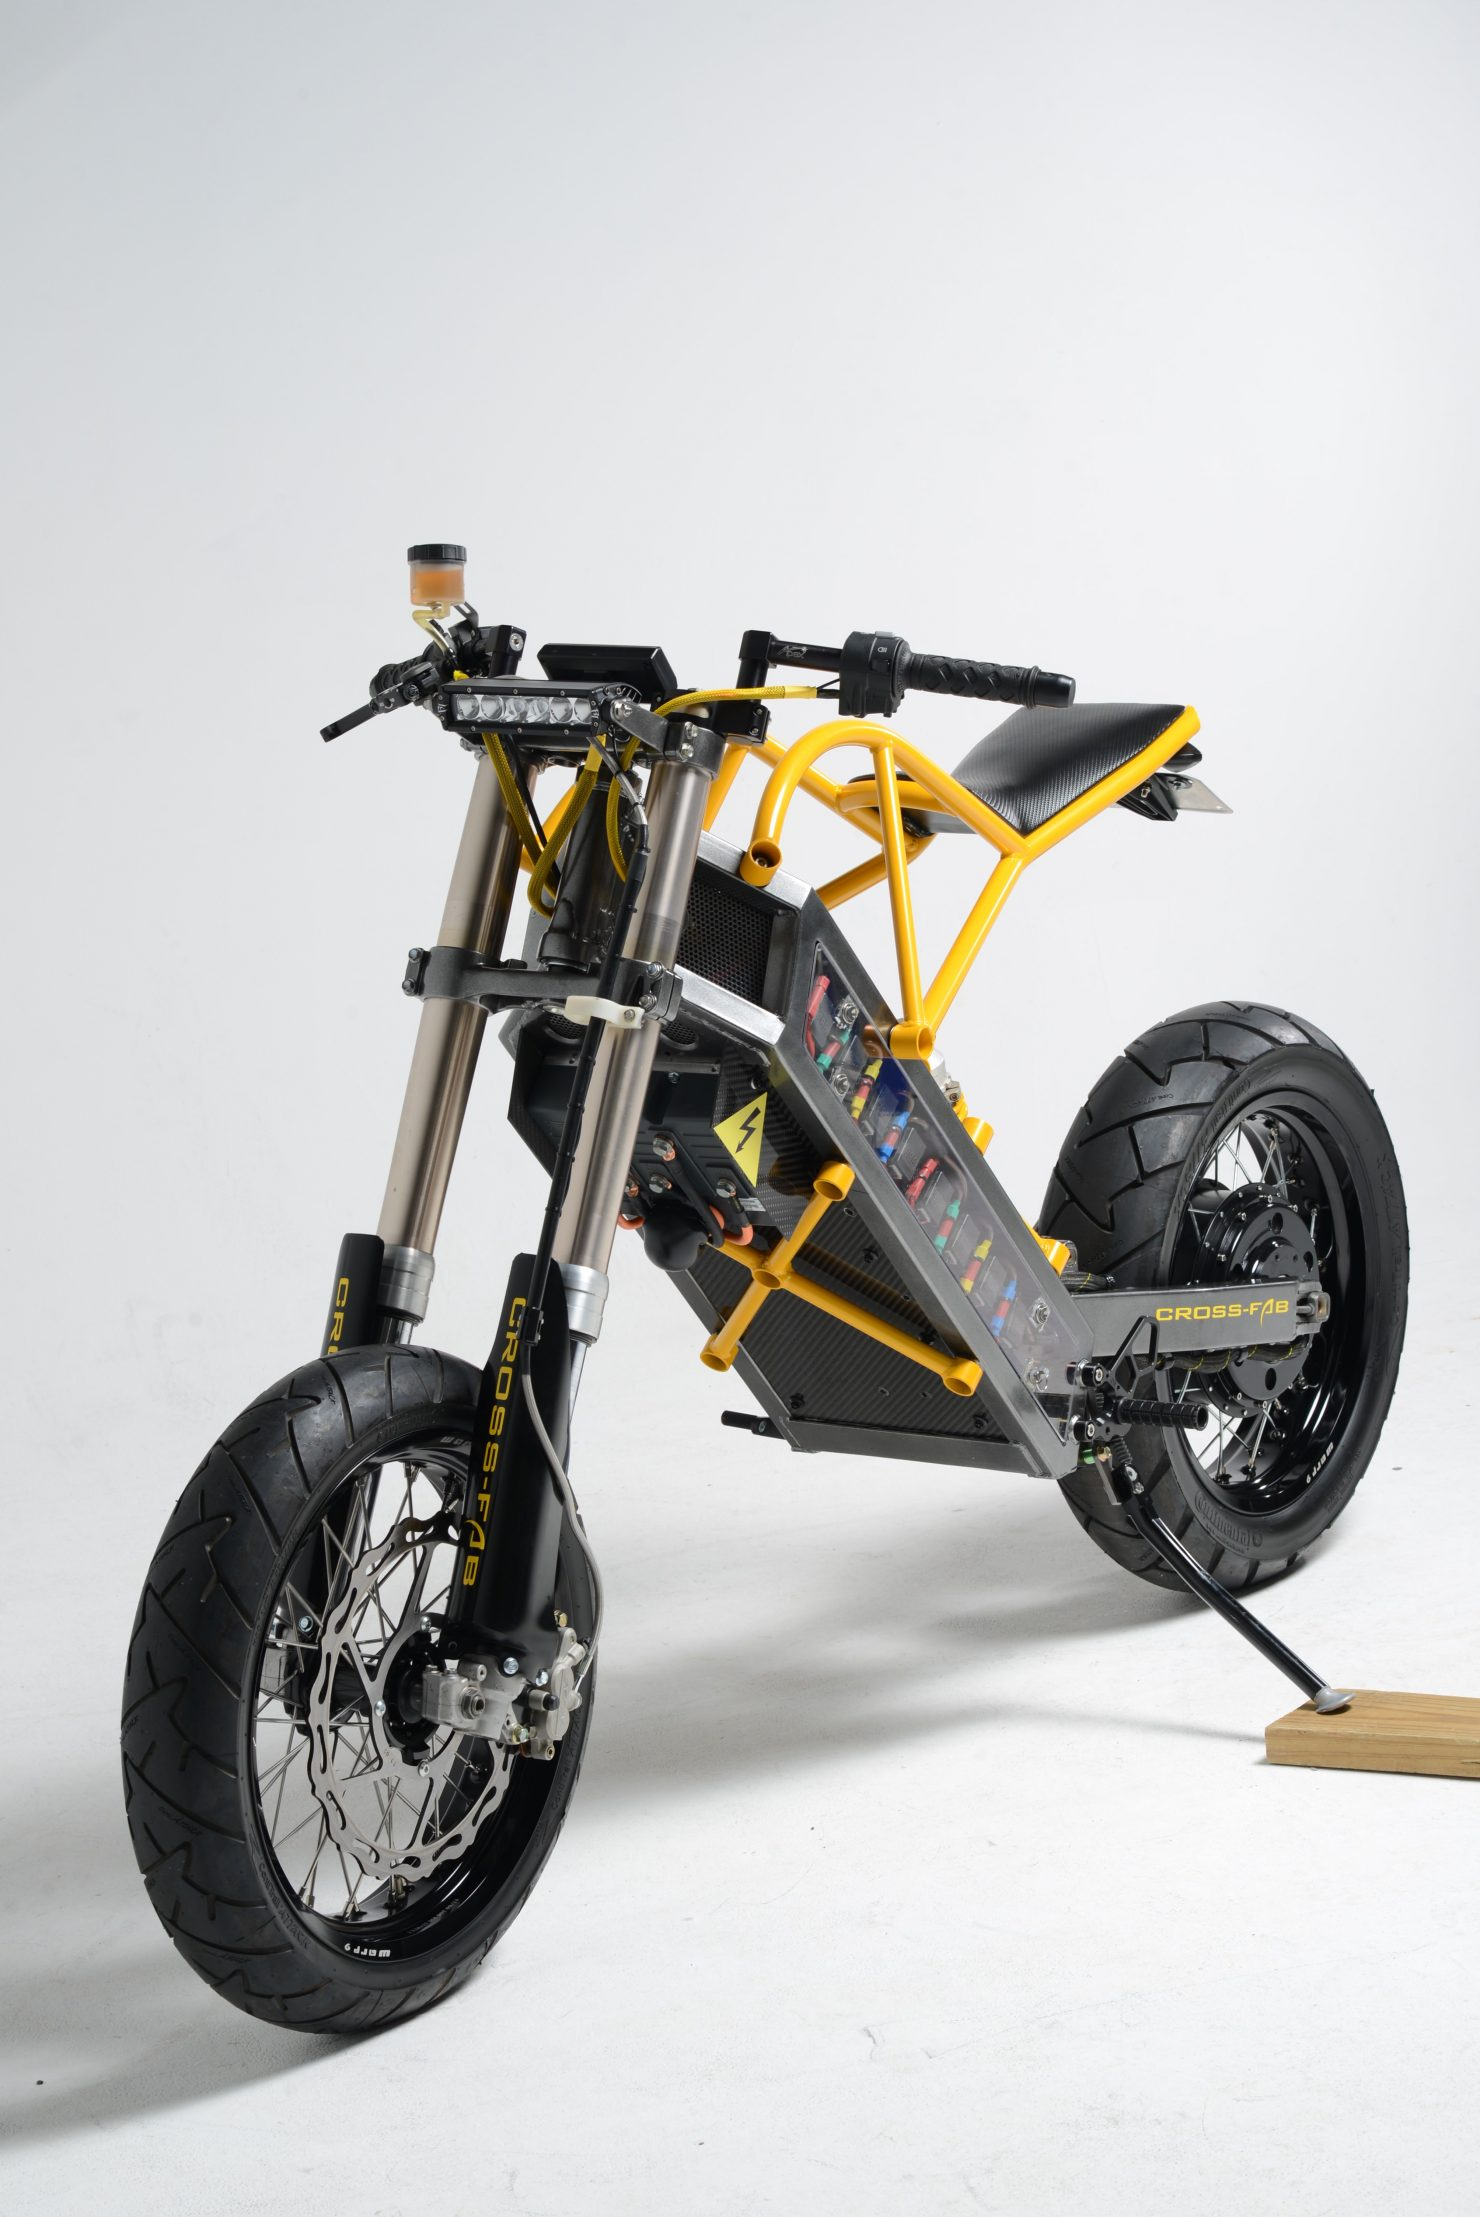 ExoDyne Electric Motorcycle 13 1480x2217 - ExoDyne Electric Motorcycle